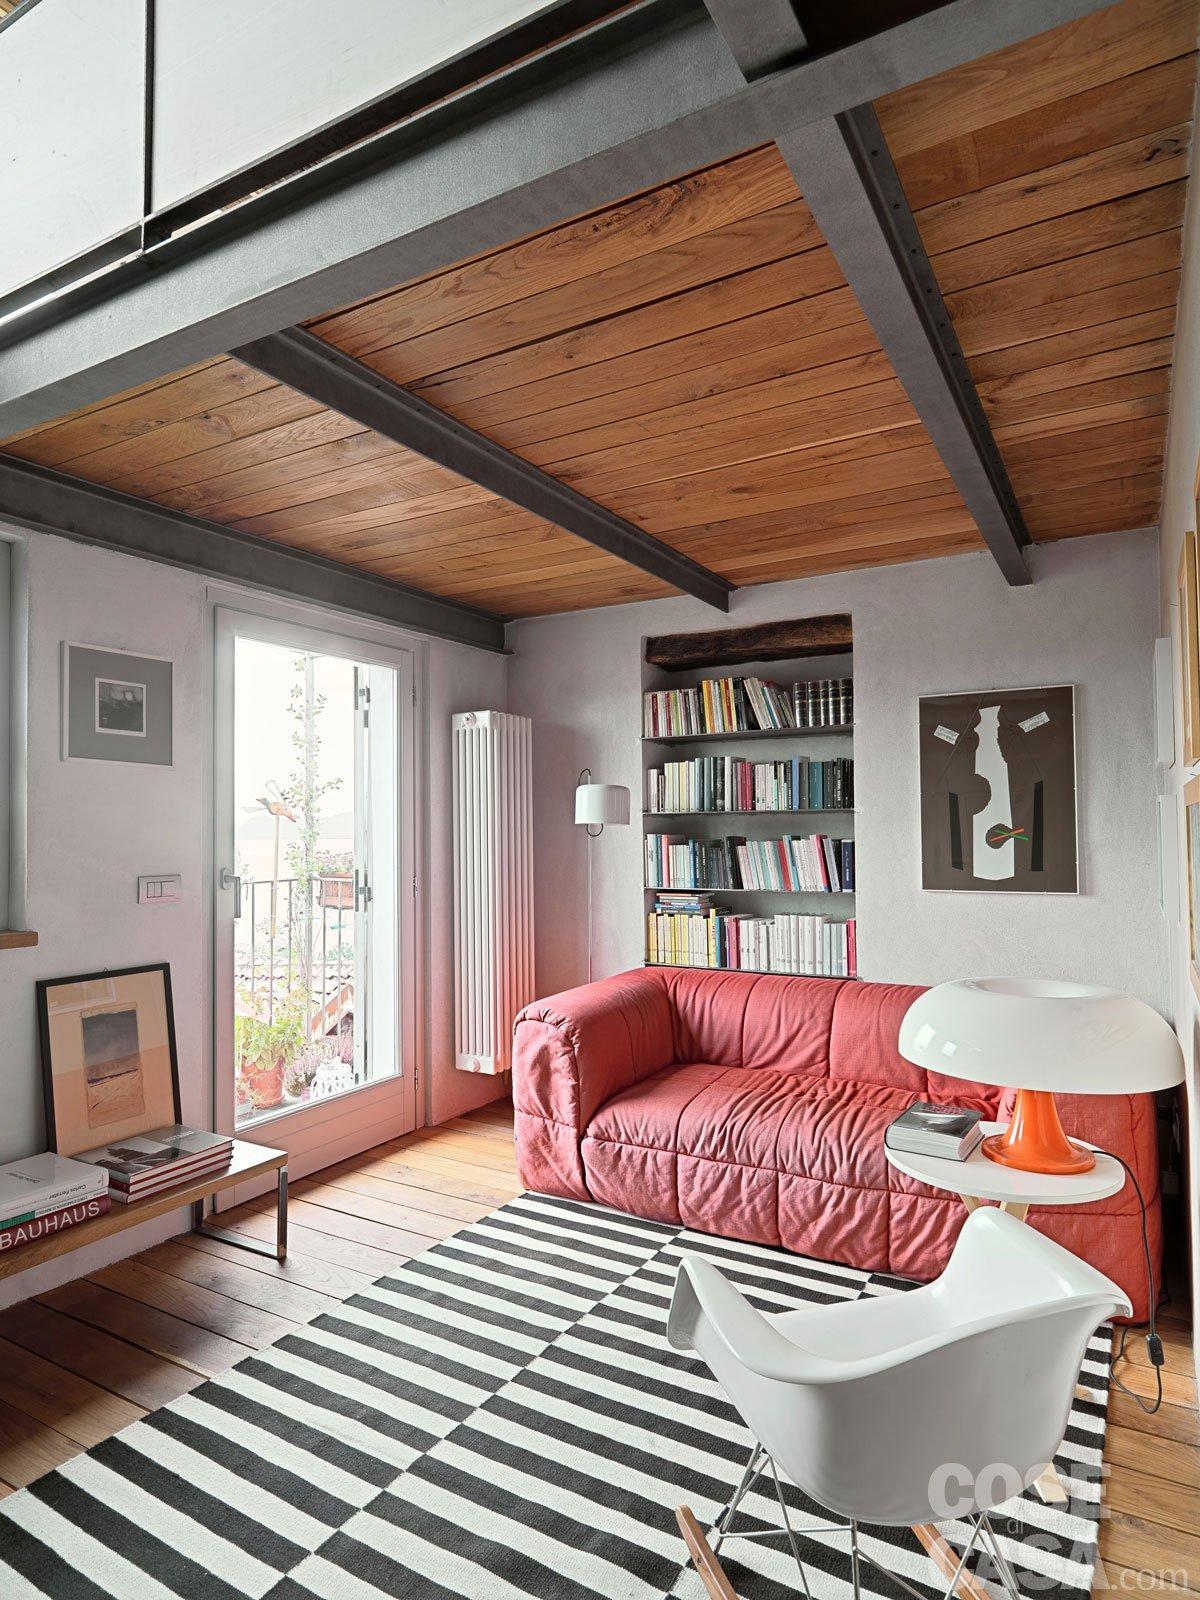 65 mq una casa che si sviluppa in verticale cose di casa - Come si arreda una casa ...